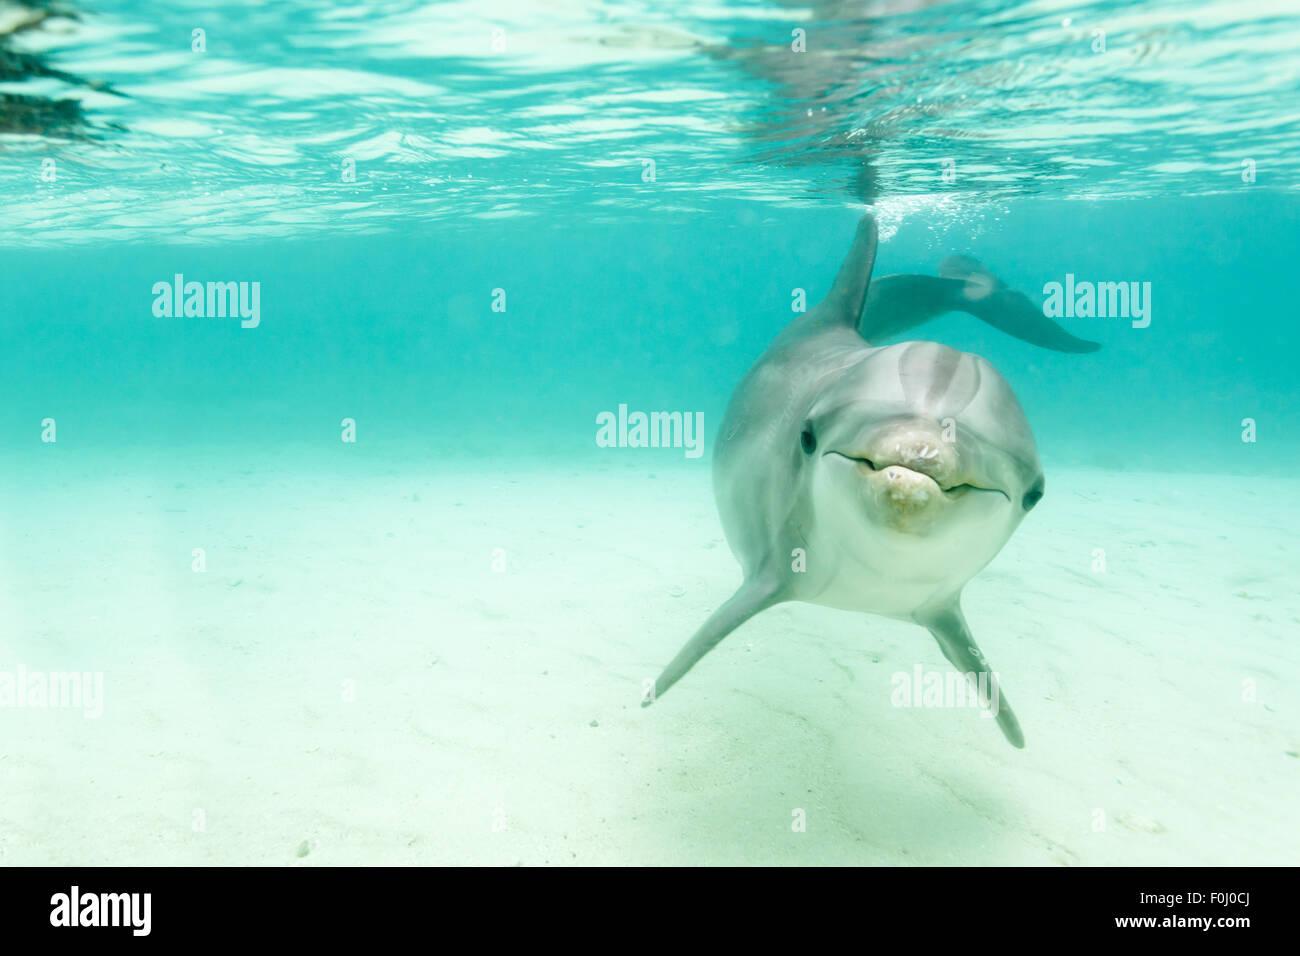 Dolphin School Of Fish Stock Photos & Dolphin School Of Fish Stock ...